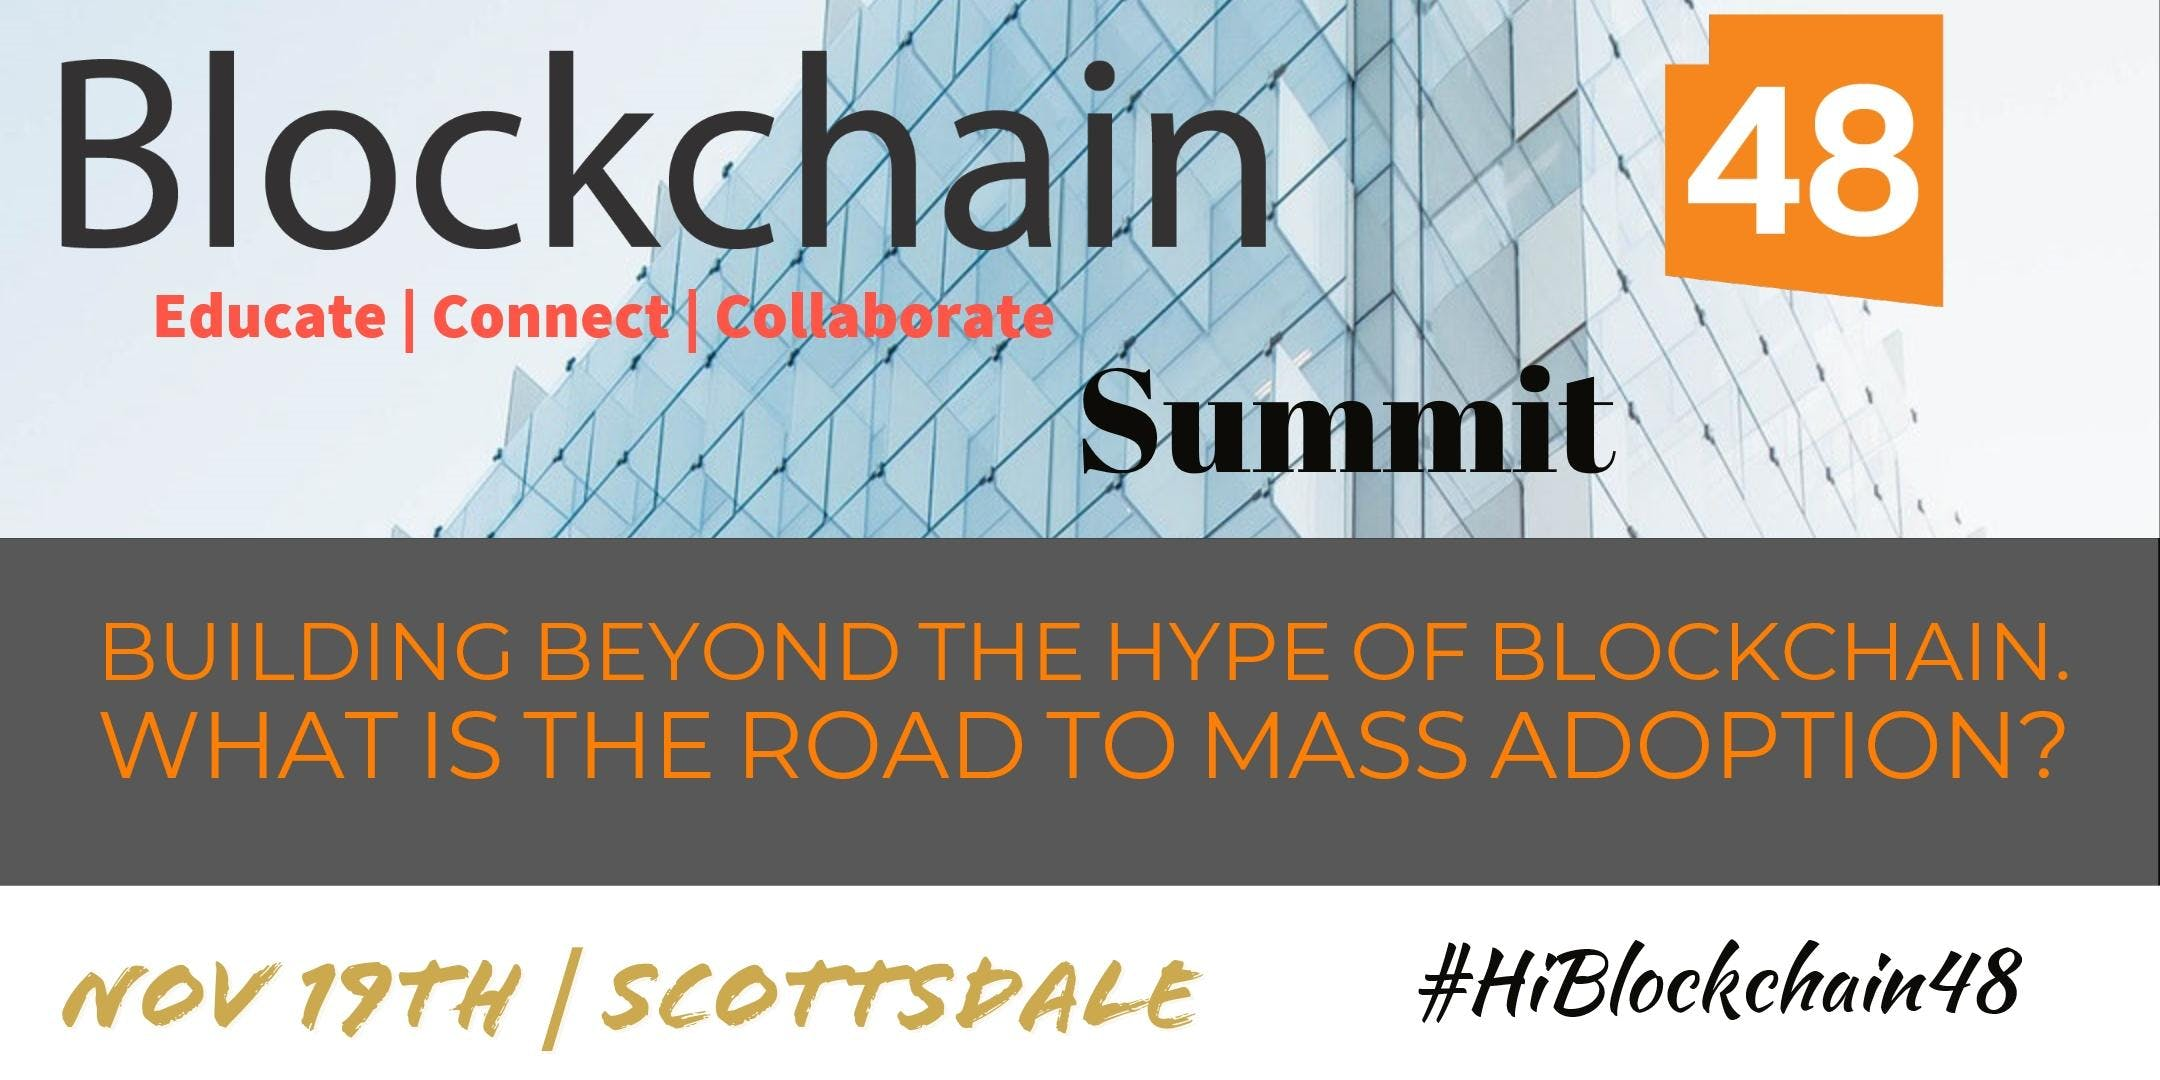 Blockchain48™ Premier Blockchain Summit #HiBlockchain48